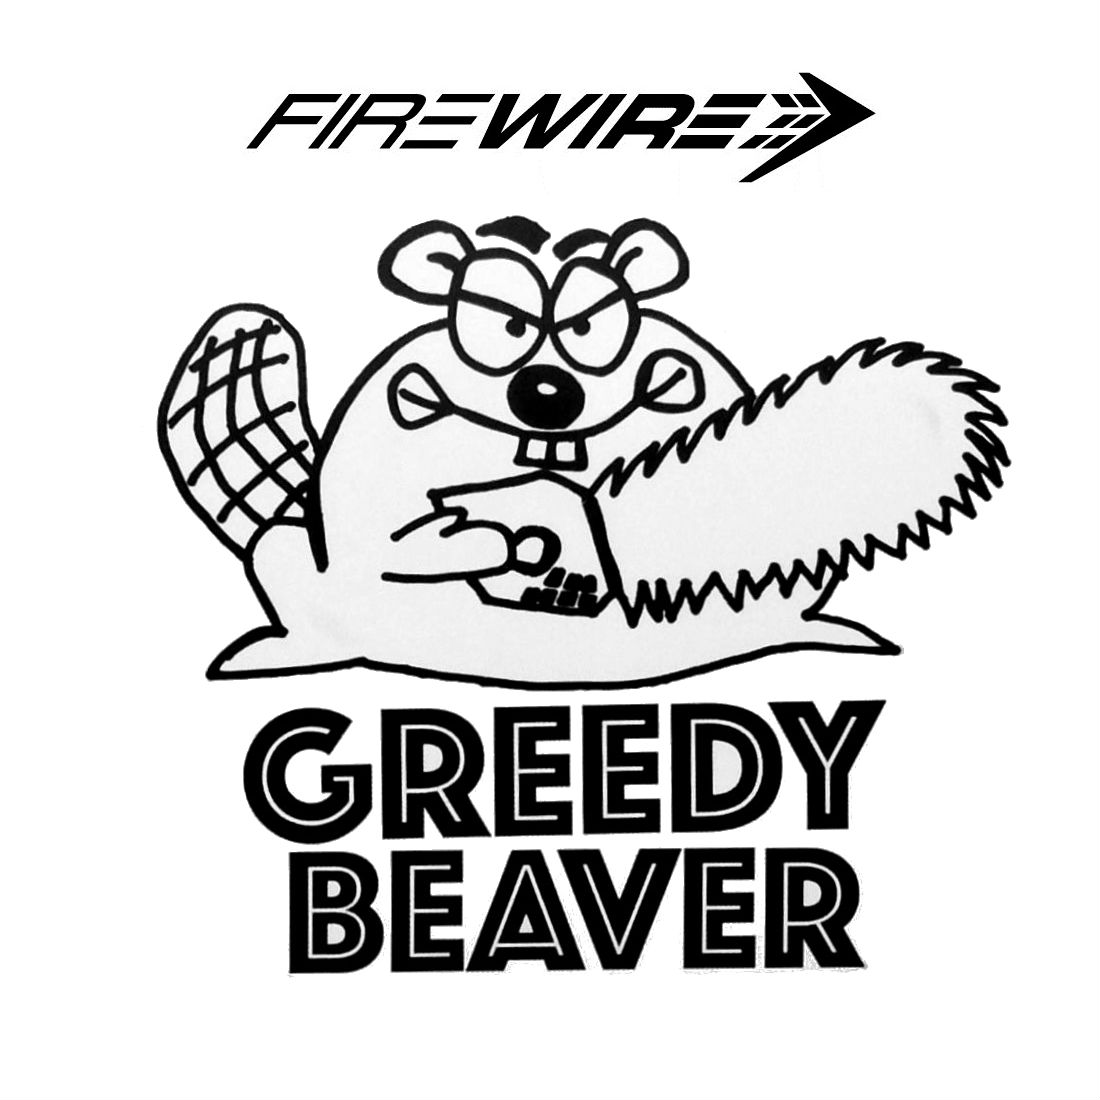 Firewire Greedy Beaver